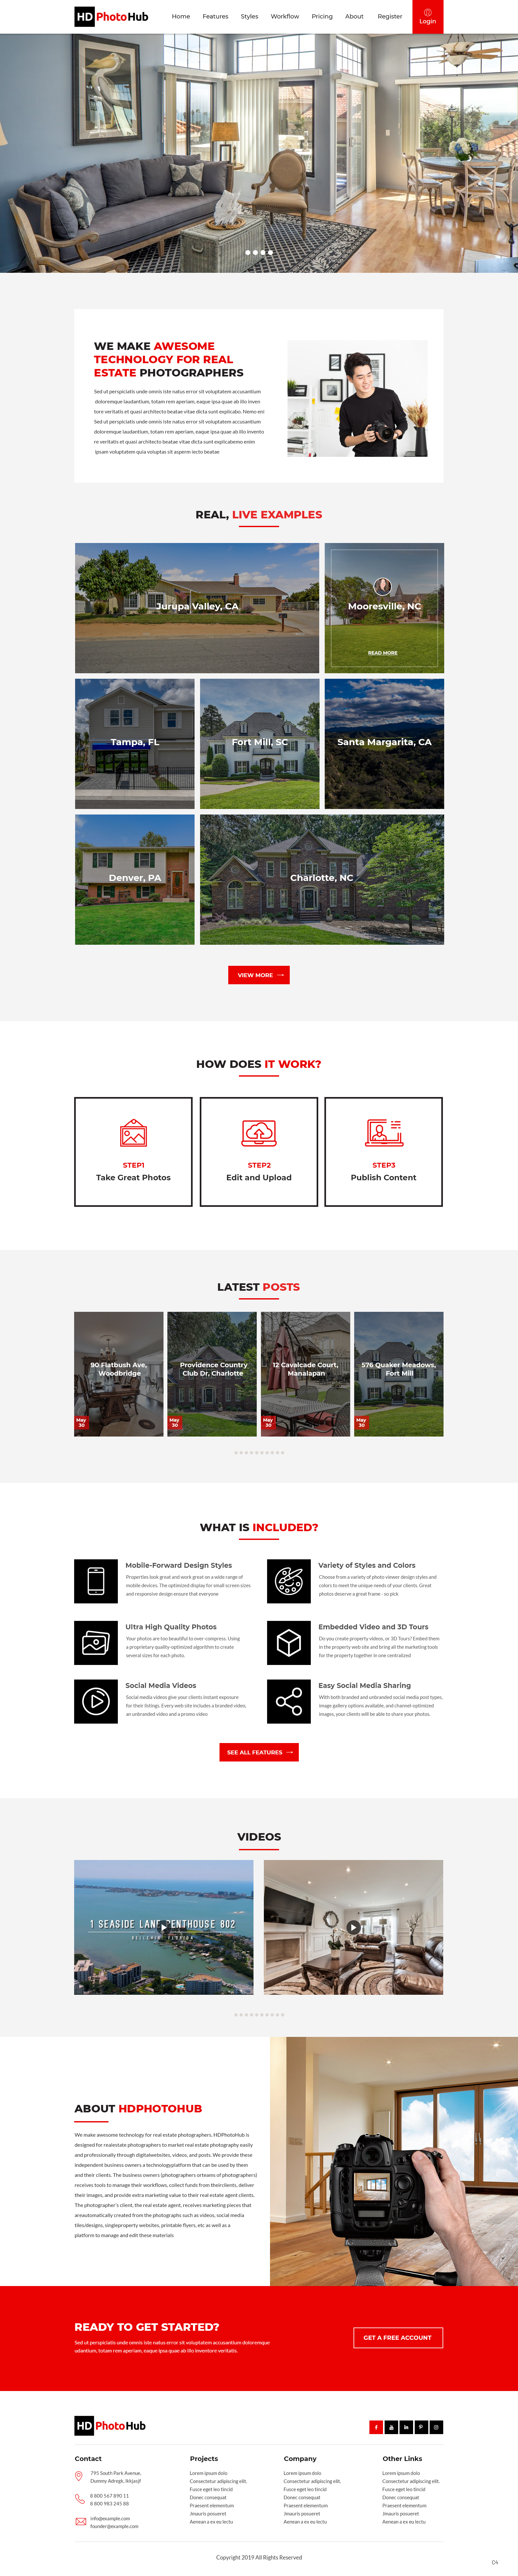 Participating Entry #2 for Website Design contest - Single Real Estate Property Listing Website Template - original